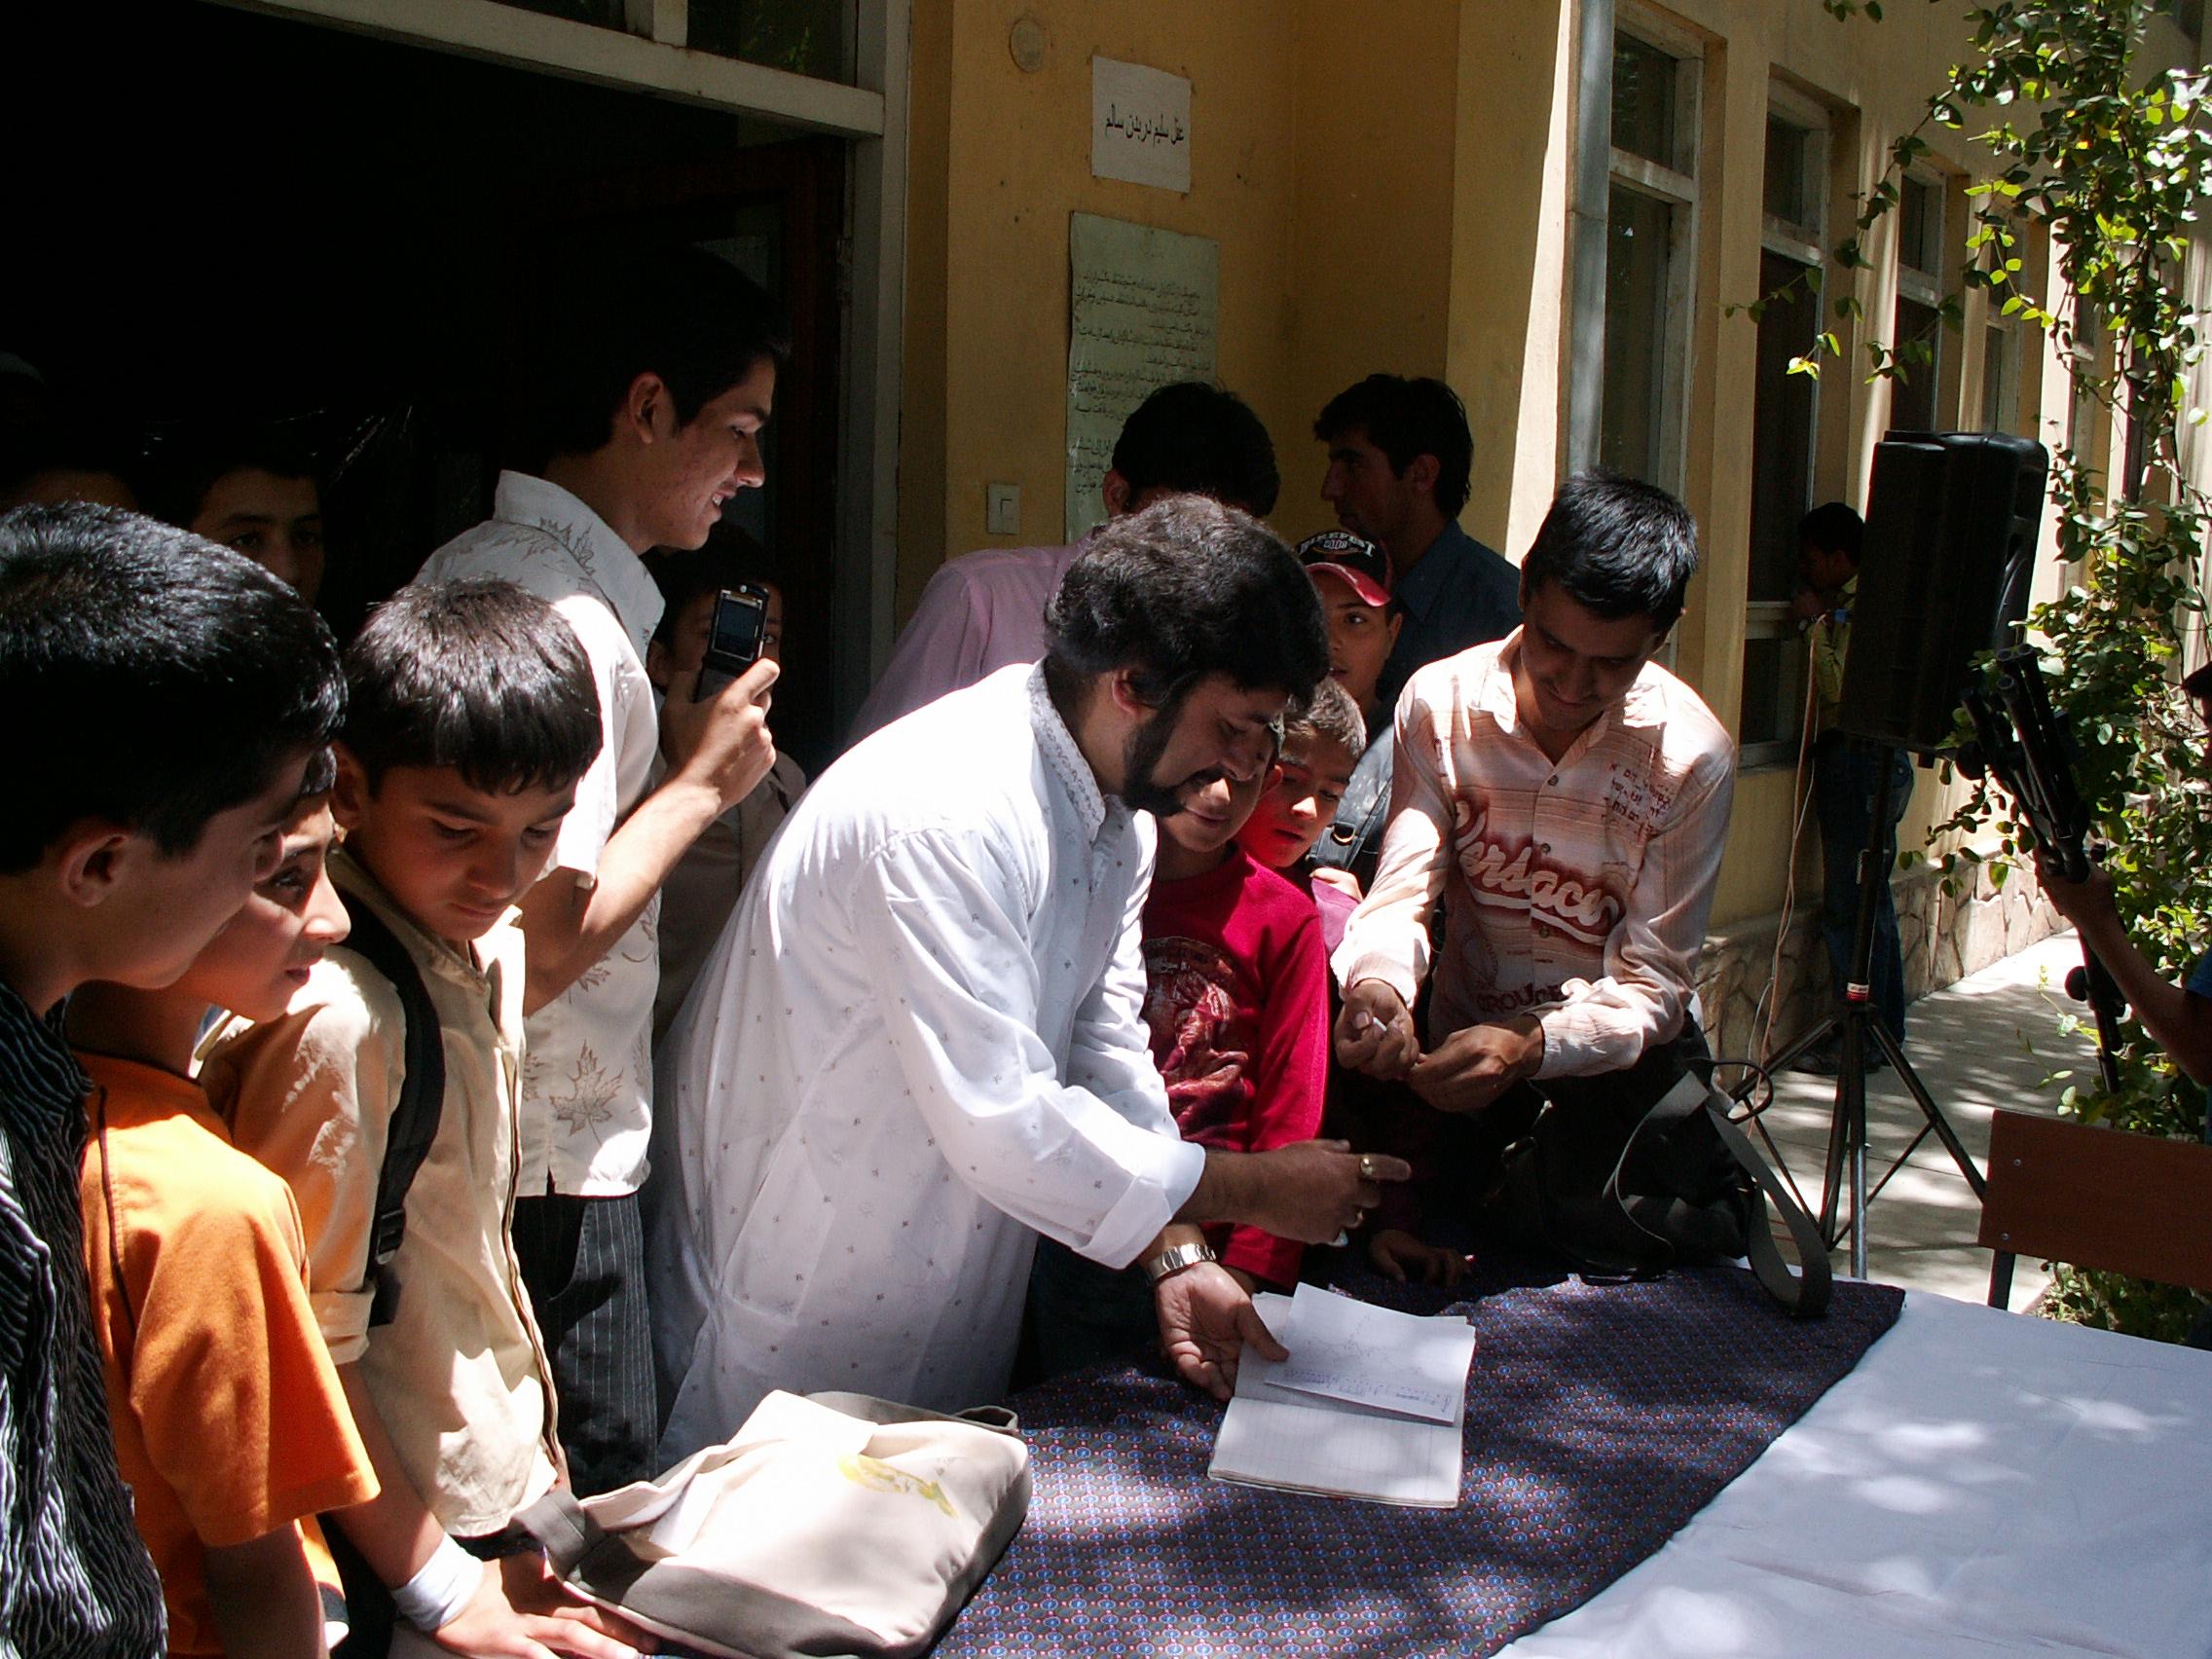 samir-chatterjee-signing-autographs-after-teaching-at-vsm_4208545714_o.jpg